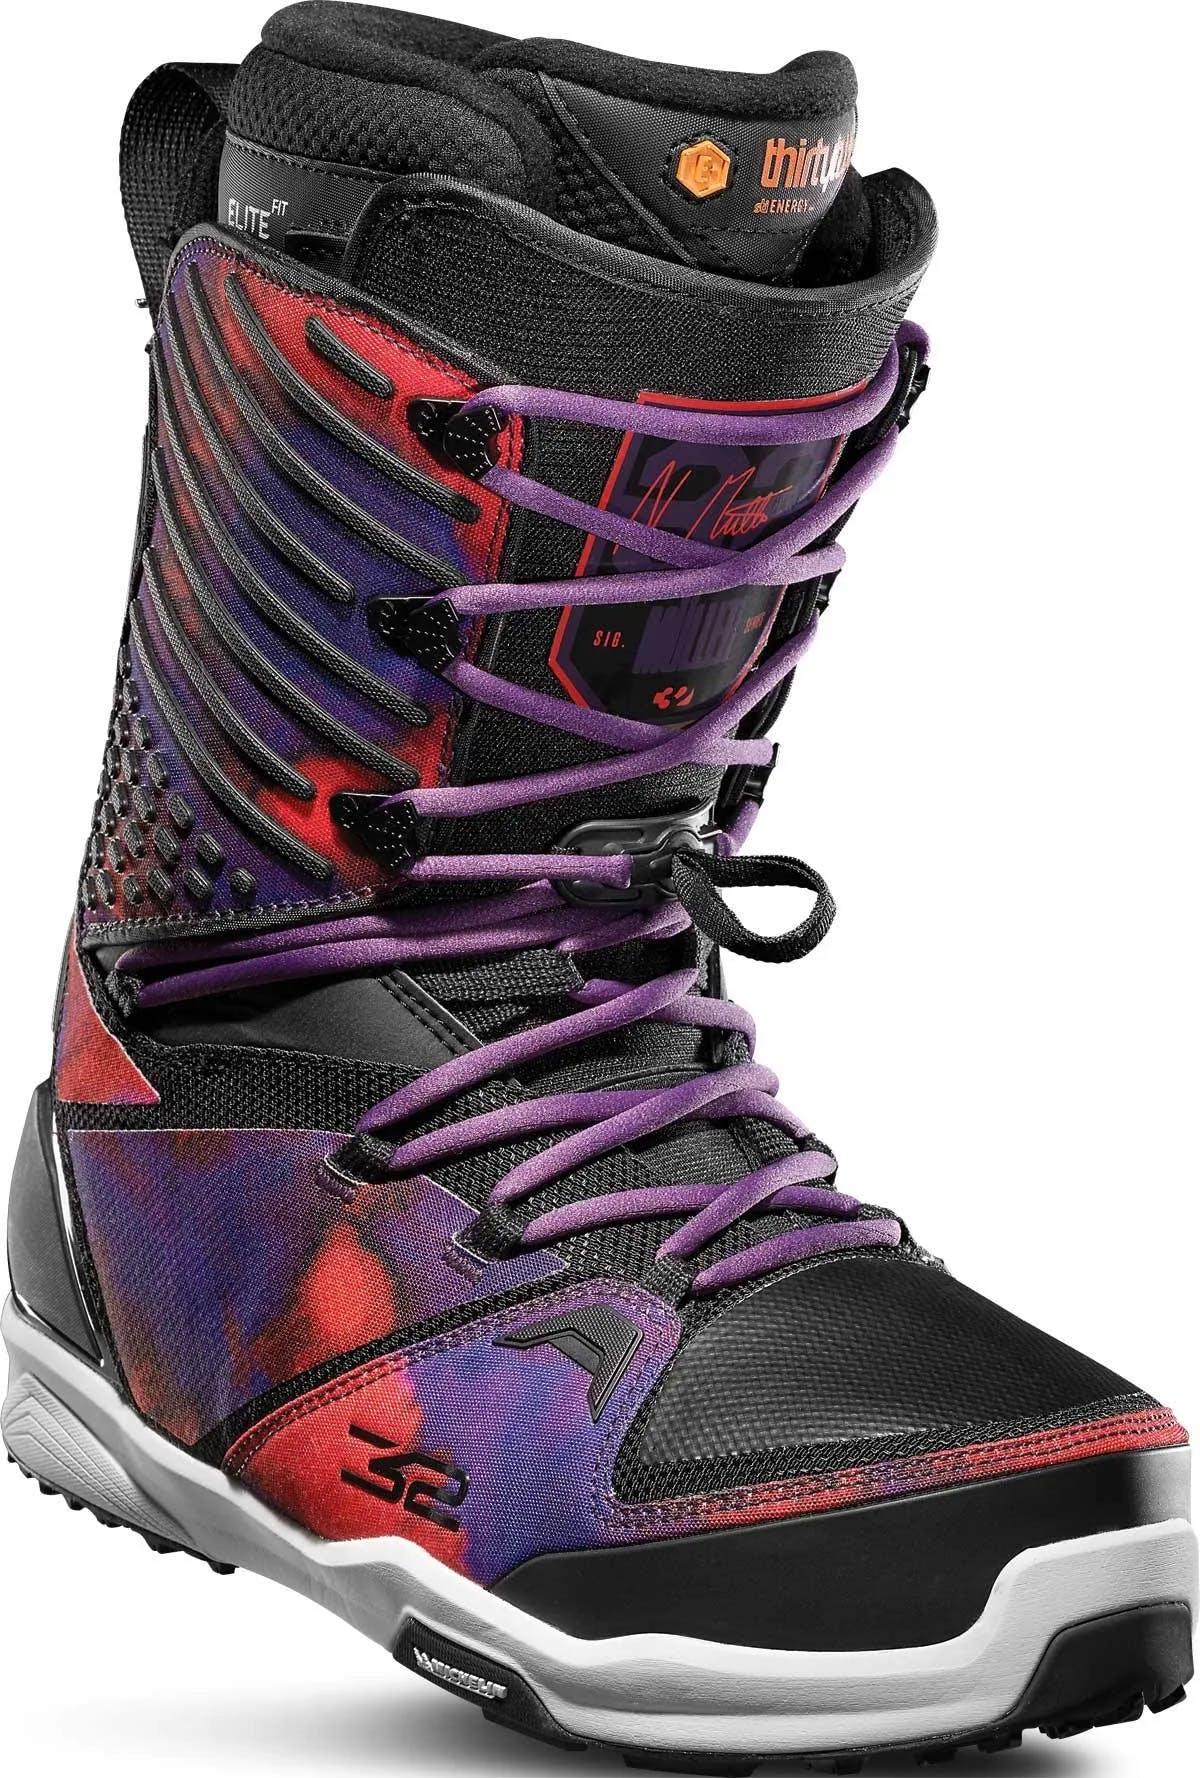 thirtytwo Mullair Tie Dye 10.5 Snowboard Boots